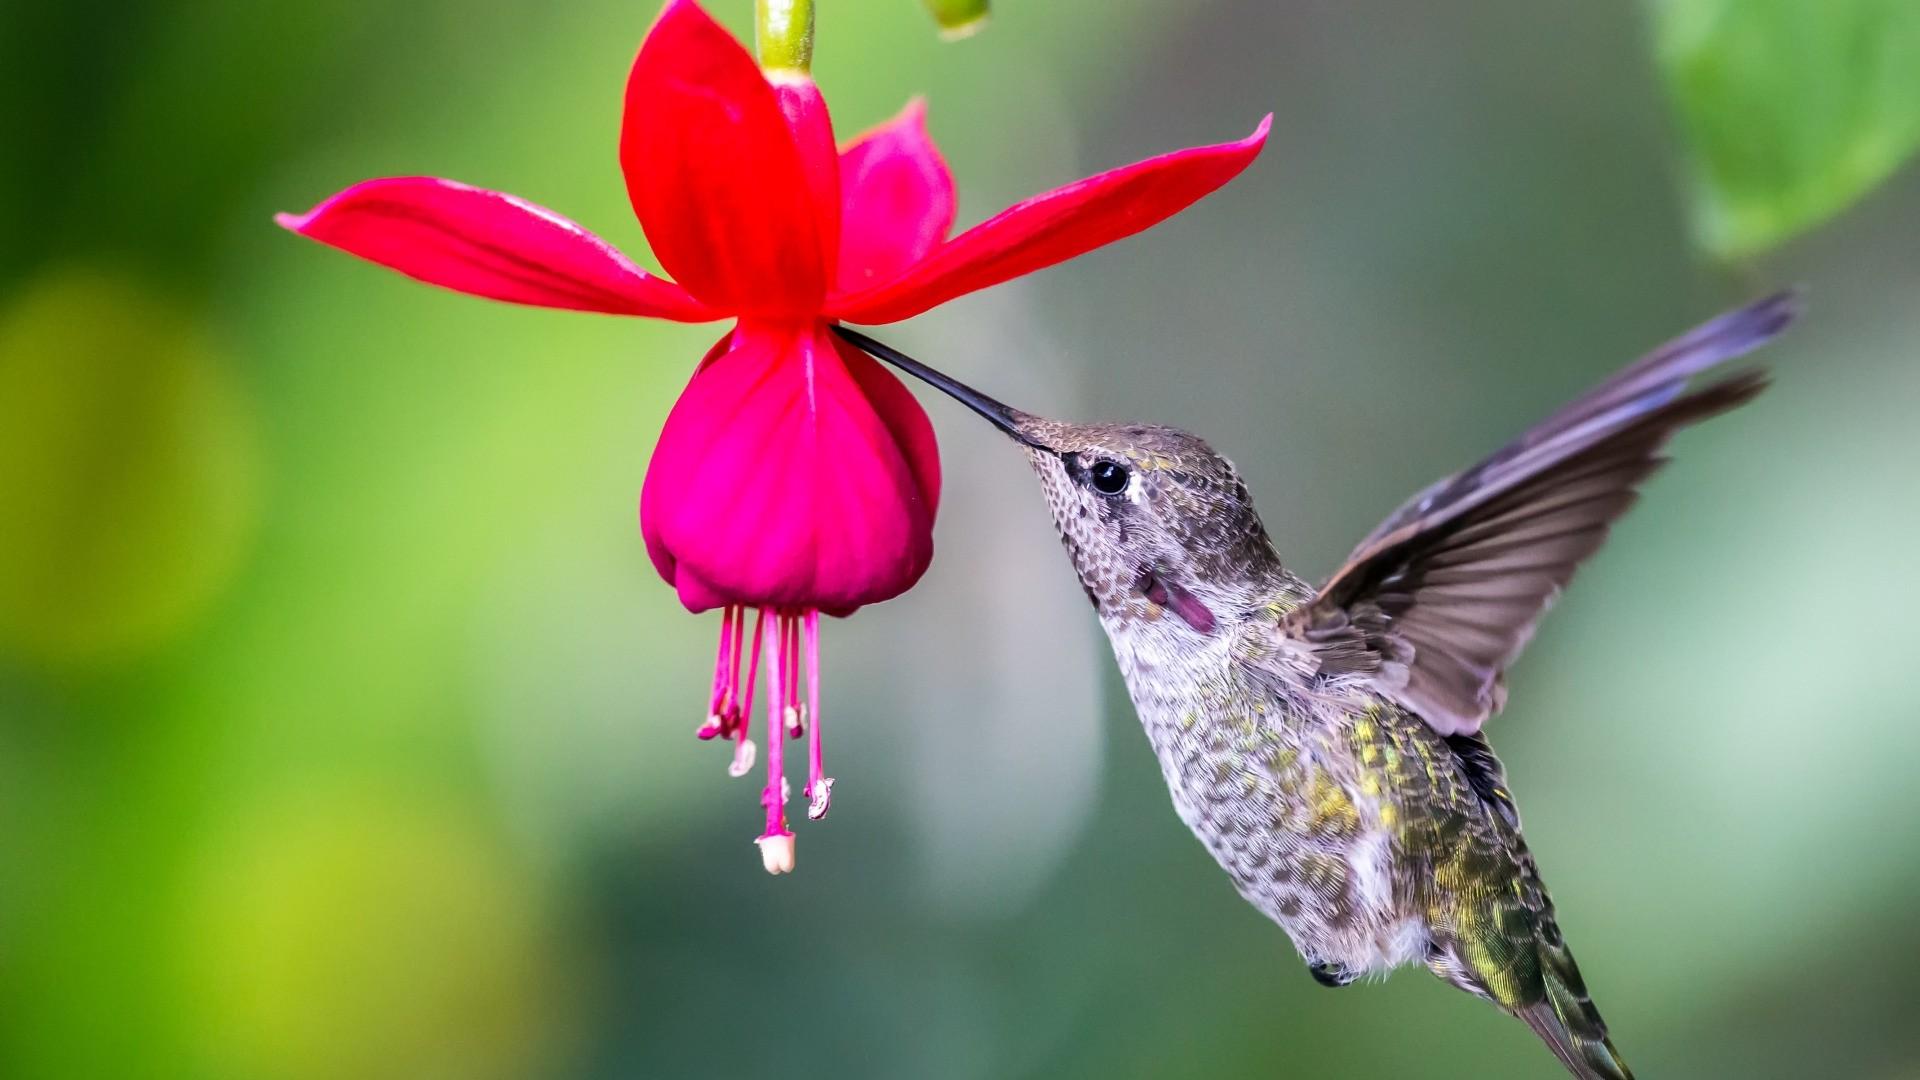 Hummingbird hd desktop wallpaper